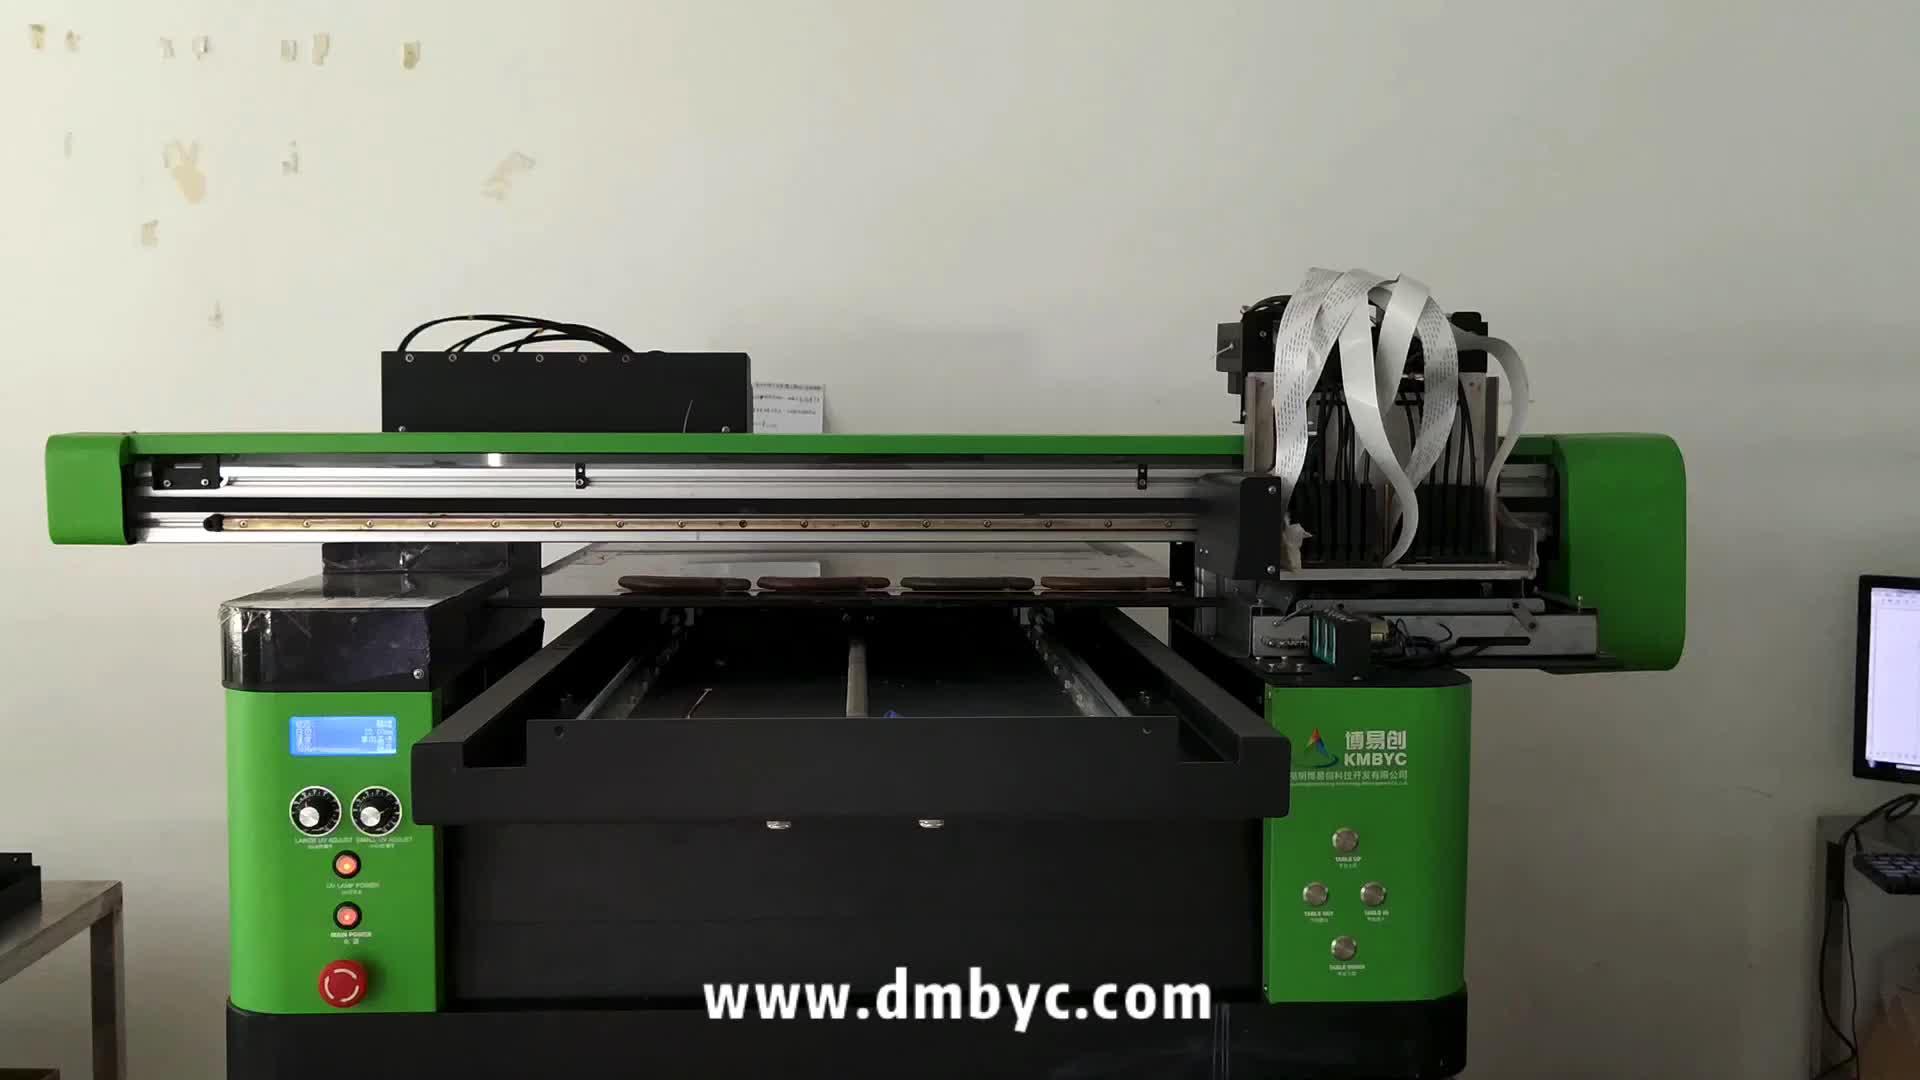 KMBYC Factory Price Plastic Challenger Digital  Diy A1 Printing Machine dtg printer